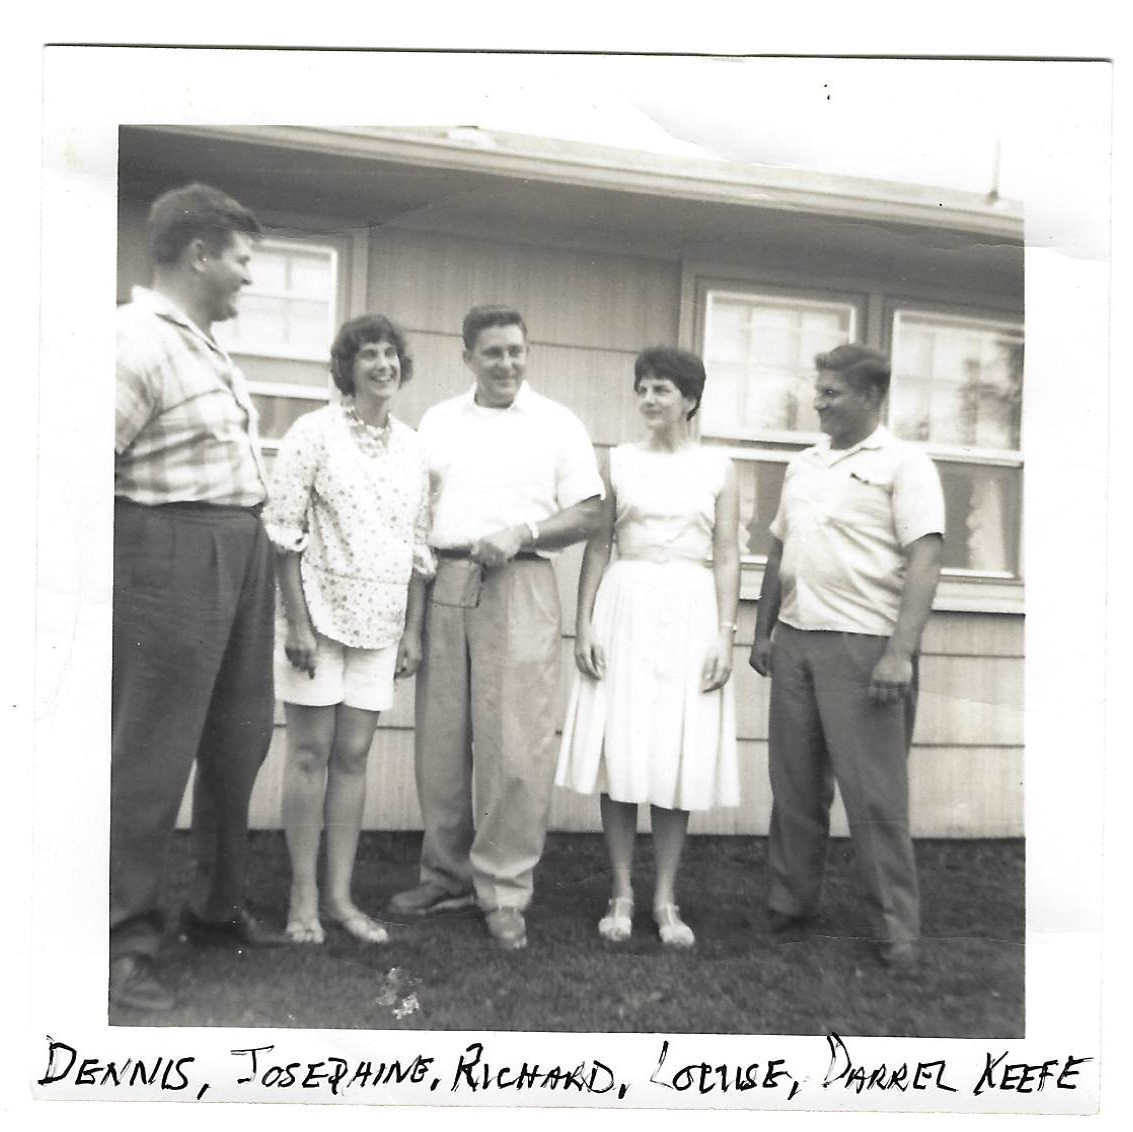 Dennis, Josephine, Richard Louise and Darrell Keefe circa 1958